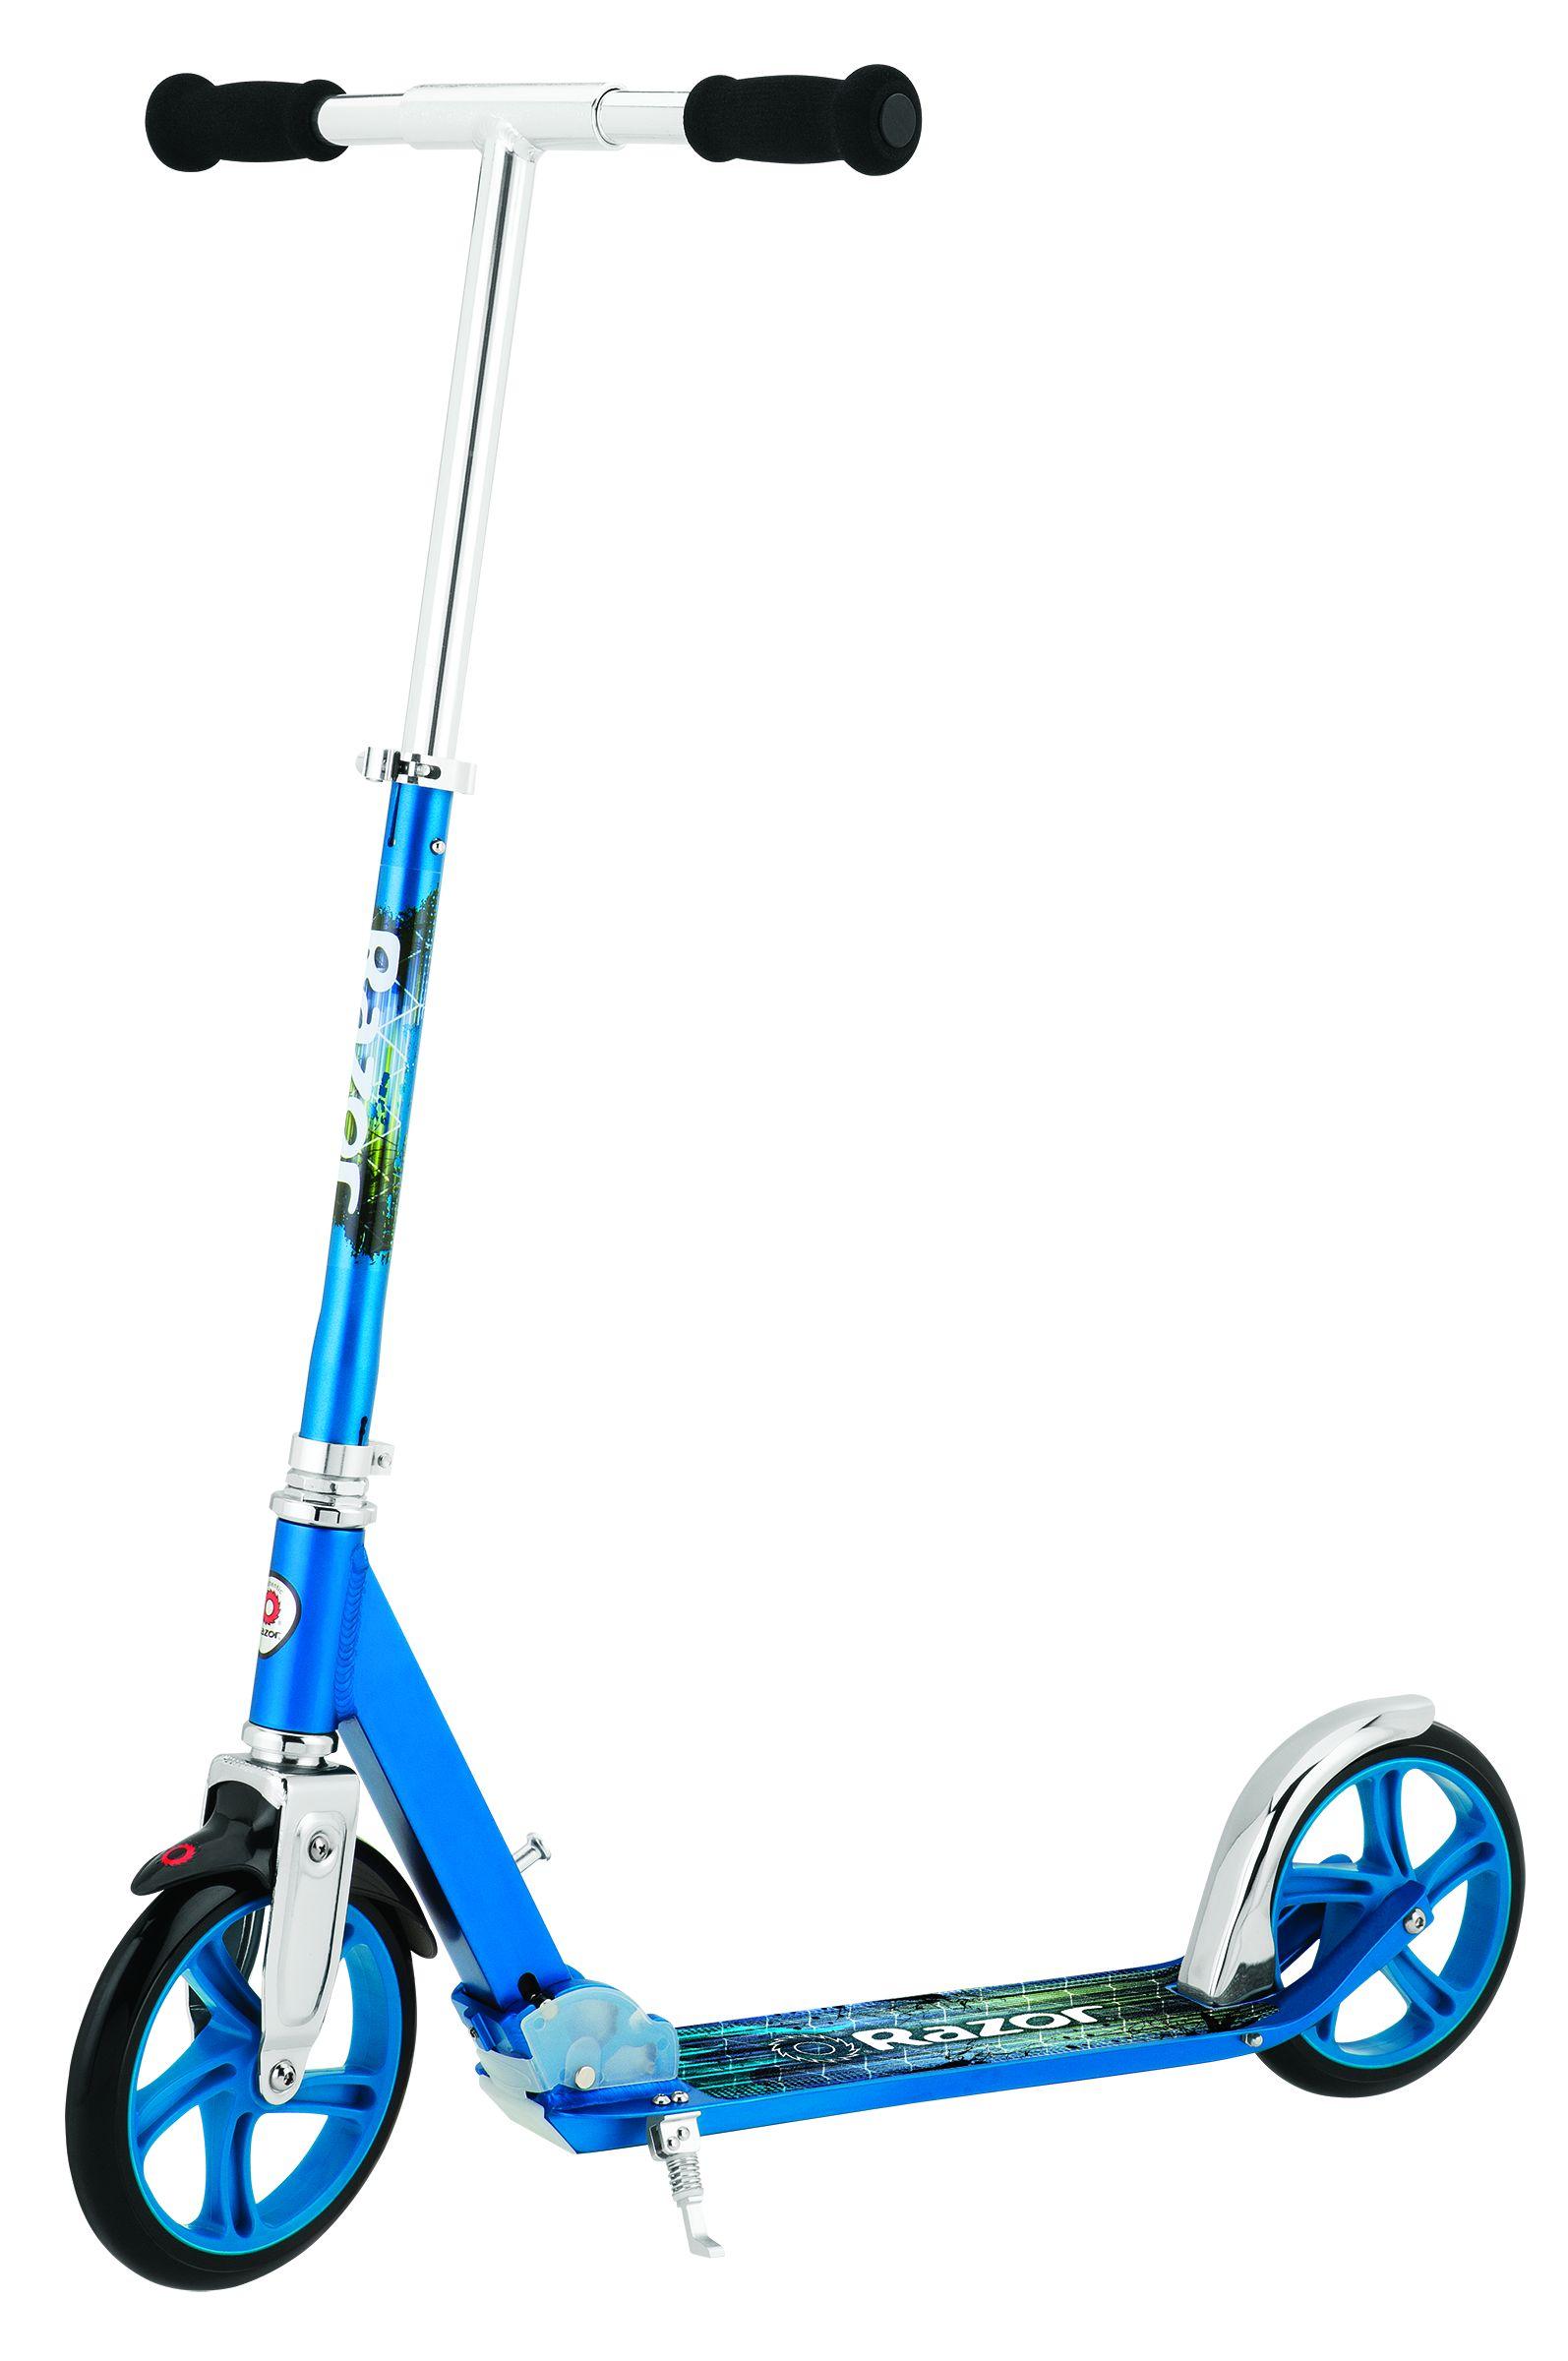 Trotineta pliabila cu roti mari adulti Razor A5 Lux Albastru imagine